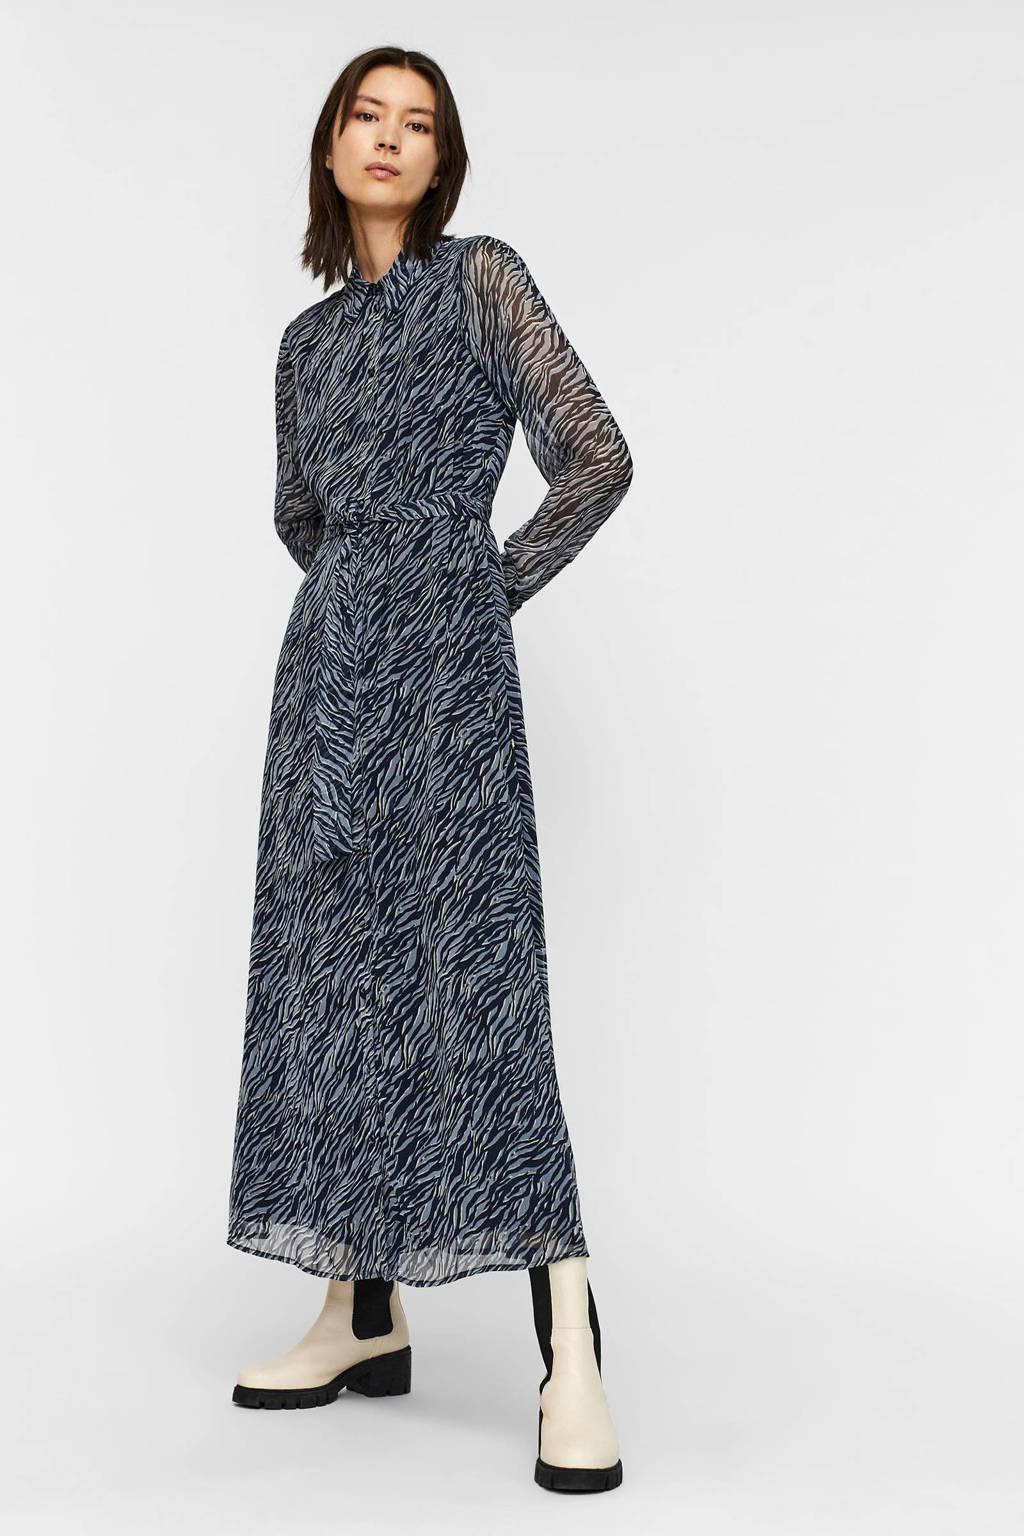 AWARE by VERO MODA semi-transparante maxi blousejurk VMRYLEE met zebraprint blauw/zwart, Blauw/zwart